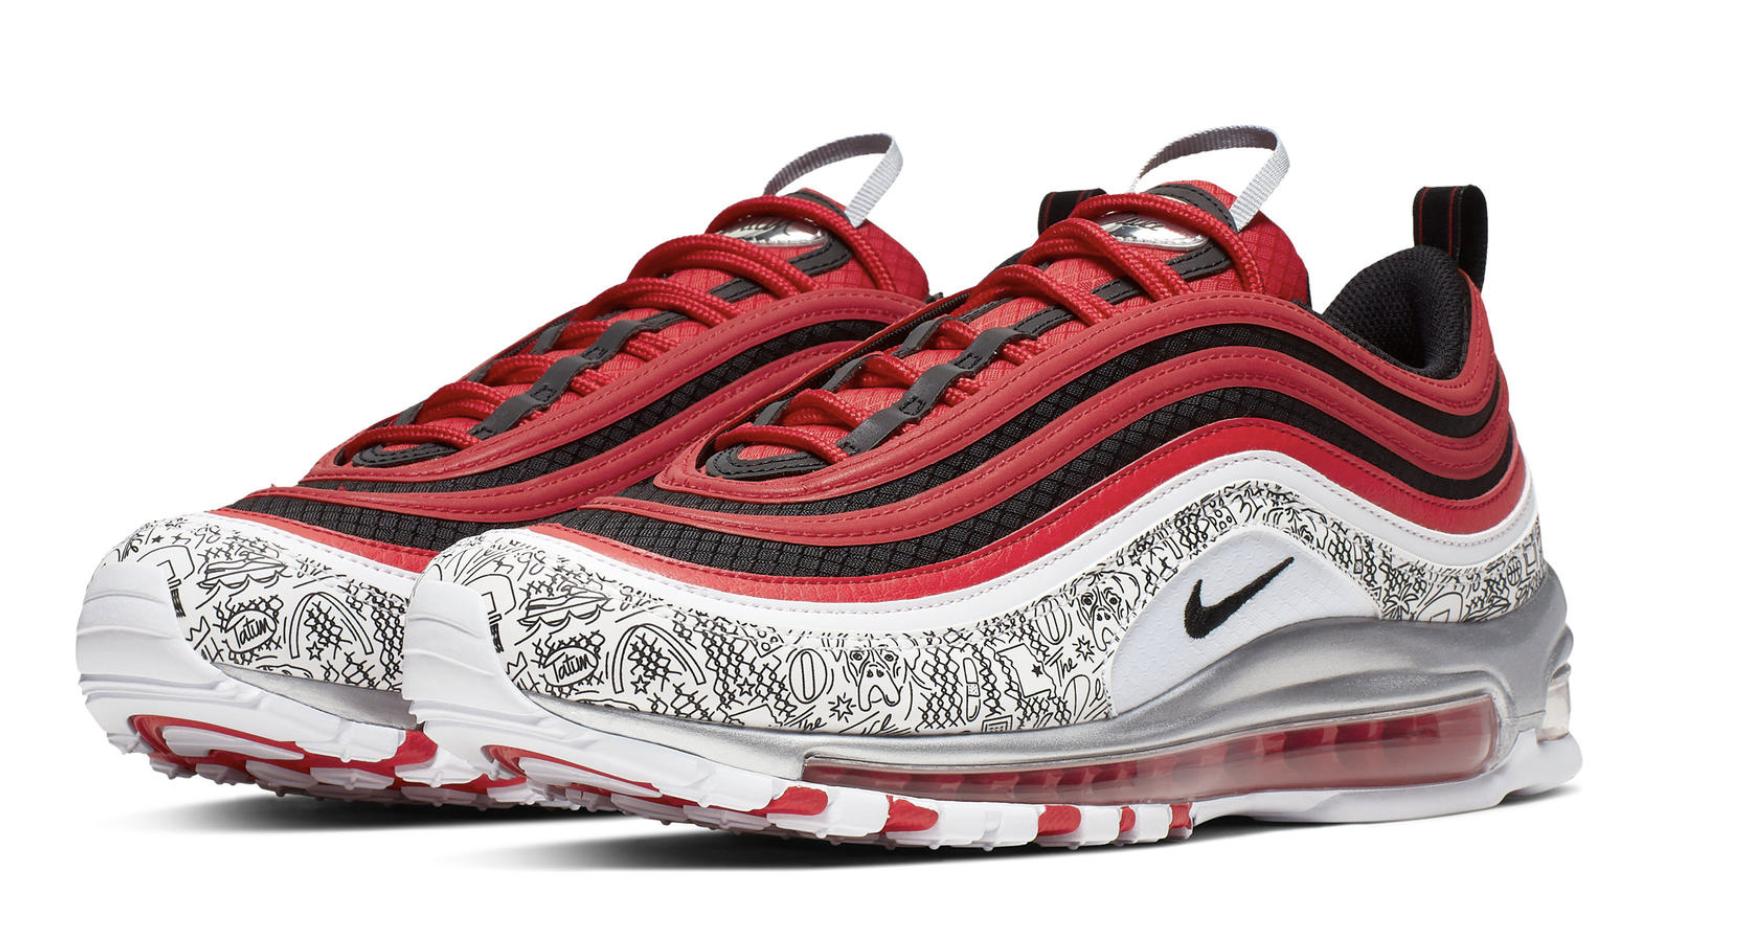 FoxBookerAnd Get Personalized Sneakers Take On Classic Tatum vm8OnyN0w